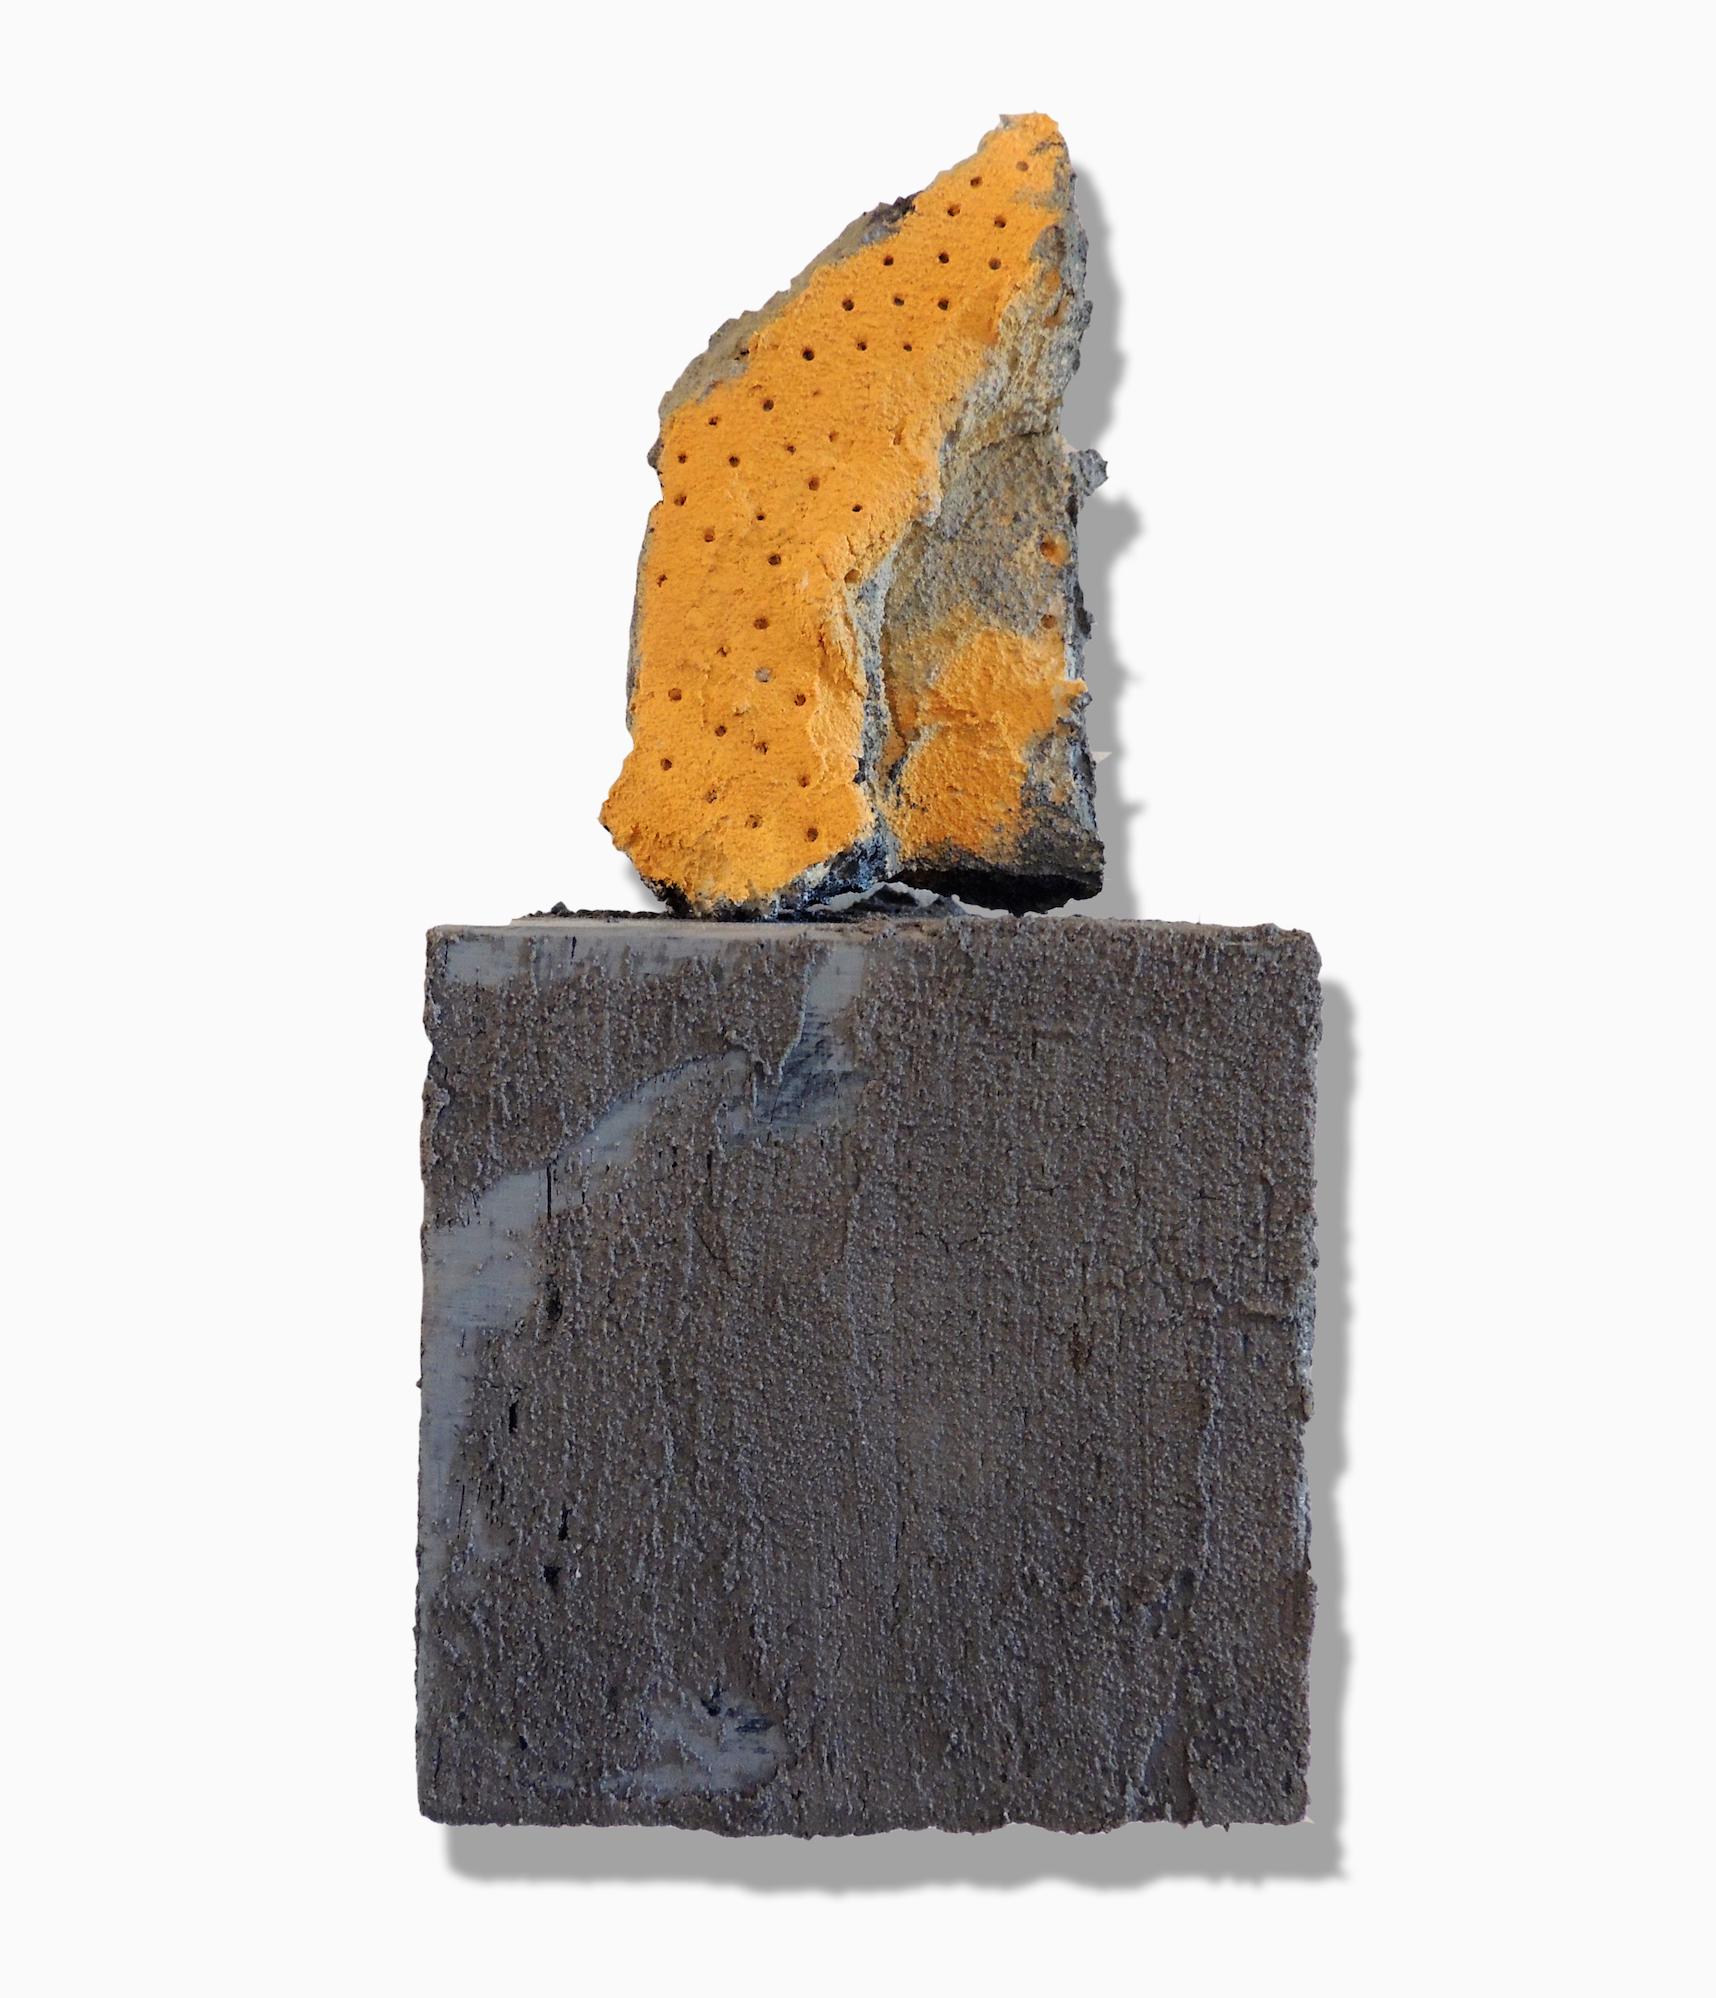 Nancy Wisti Grayson,  Found: San Clemente , Acrylic, graphite, house paint, grout, styrofoam on wood base, 8.5 x 3.5 x 3.5 inches